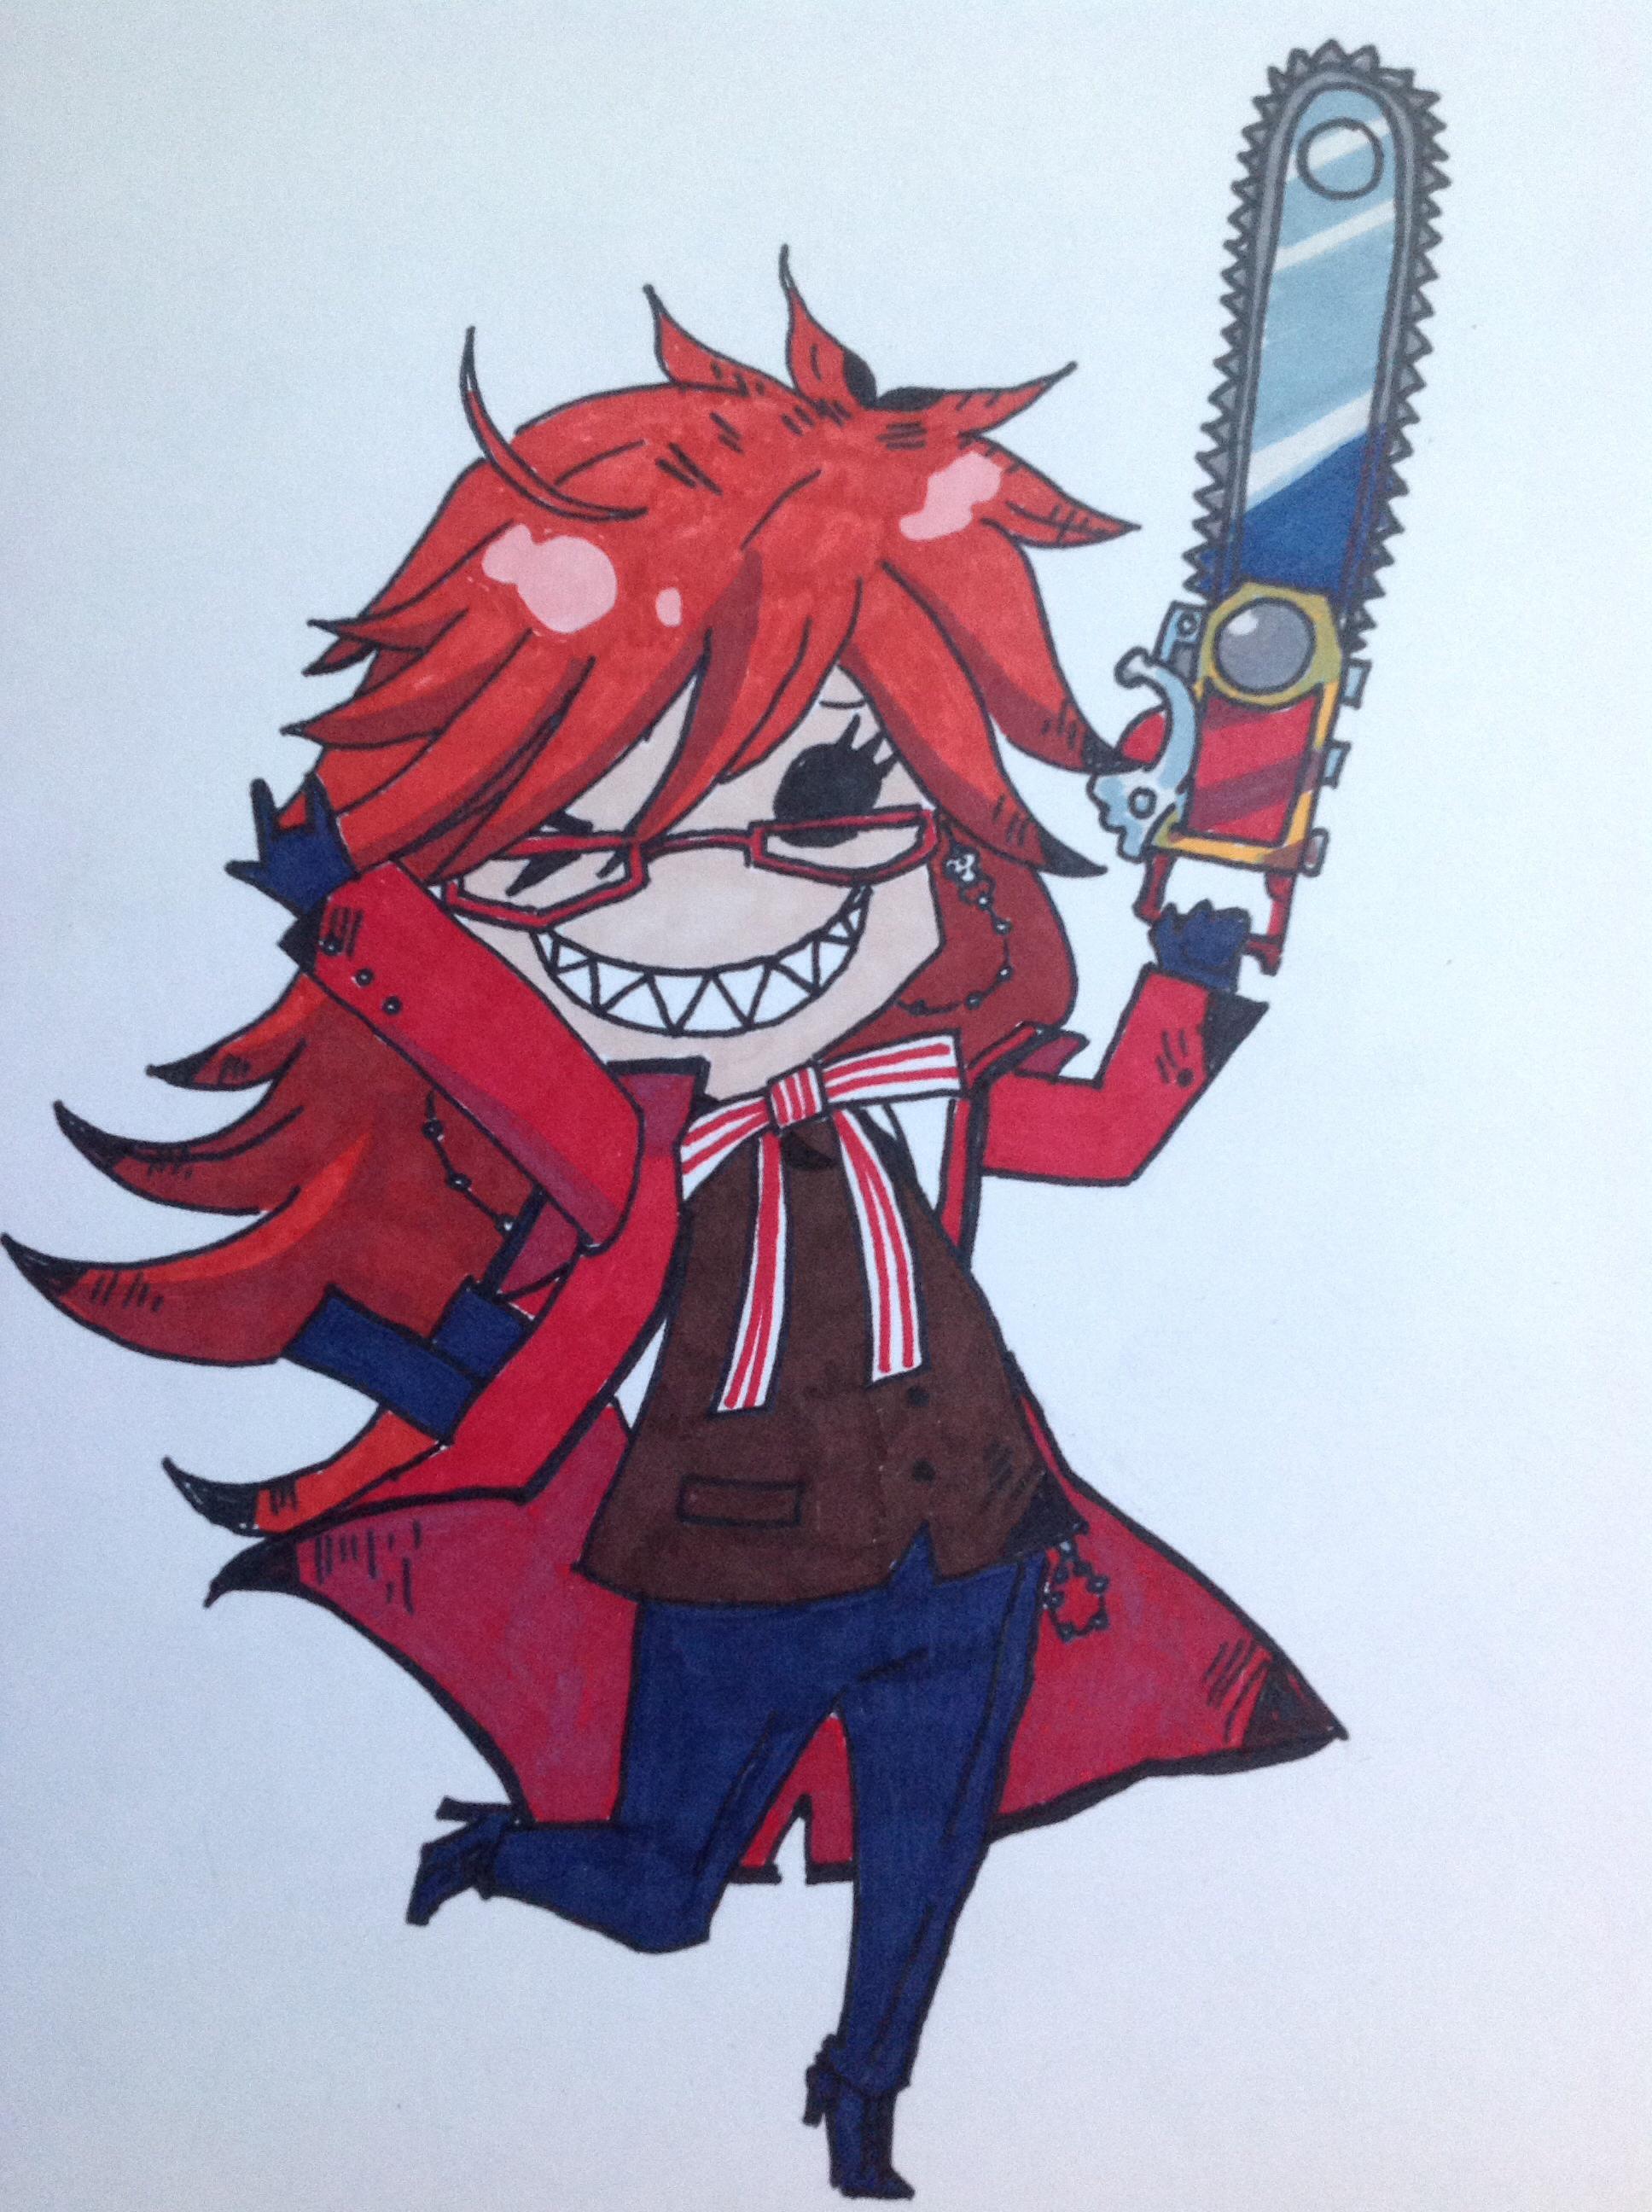 Drawn scythe red Scythe Sutcliff Butler red death